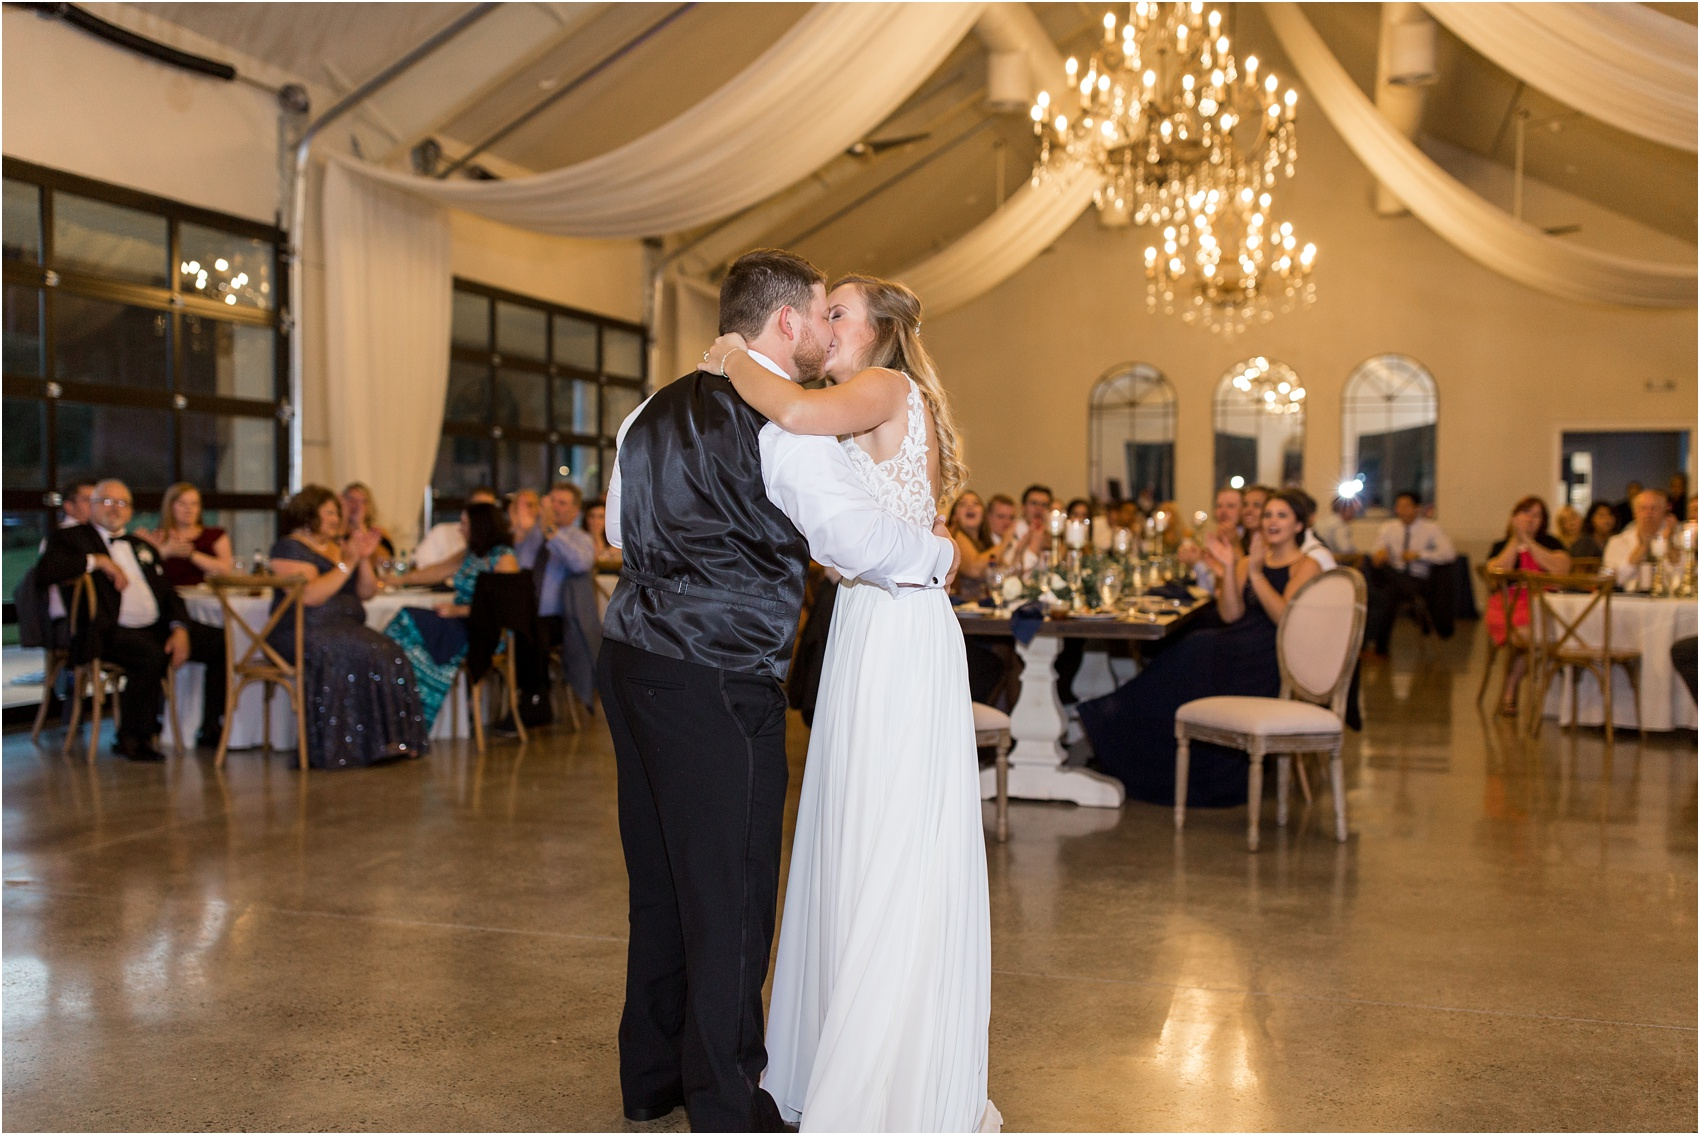 Savannah Eve Photography- Jurek-Woodworth Wedding- Sneak Peek-95.jpg